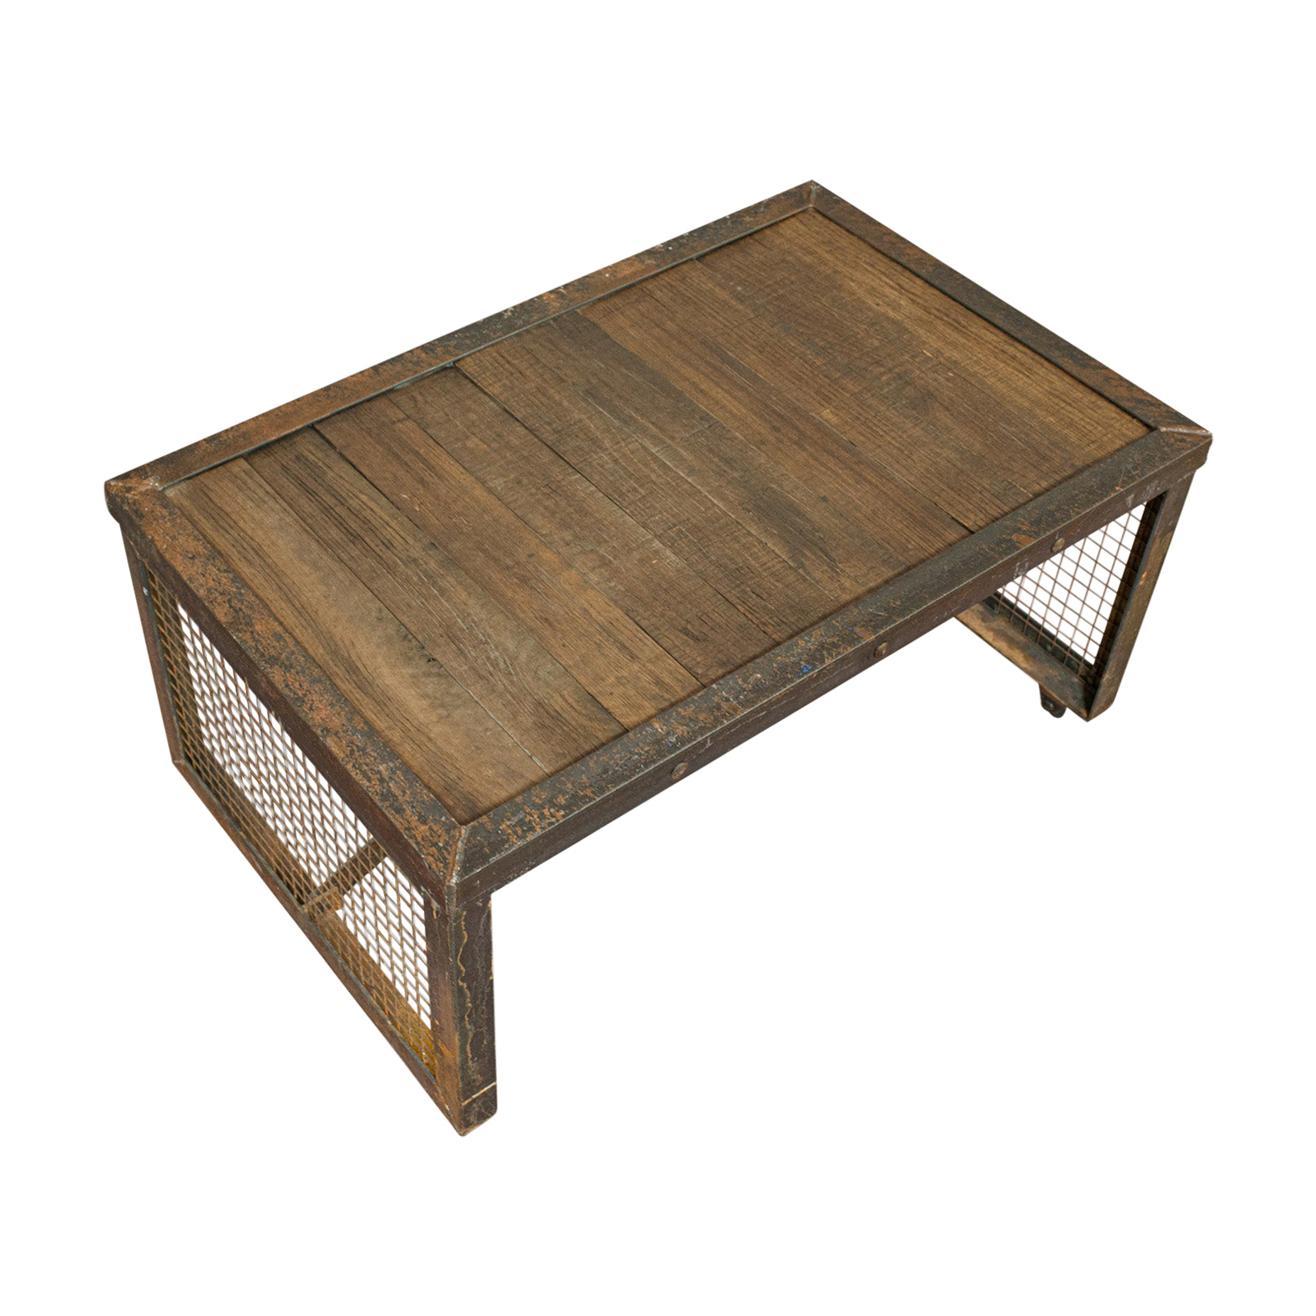 Vintage Industrial Coffee Table, English, Steel, Oak, Late 20th Century